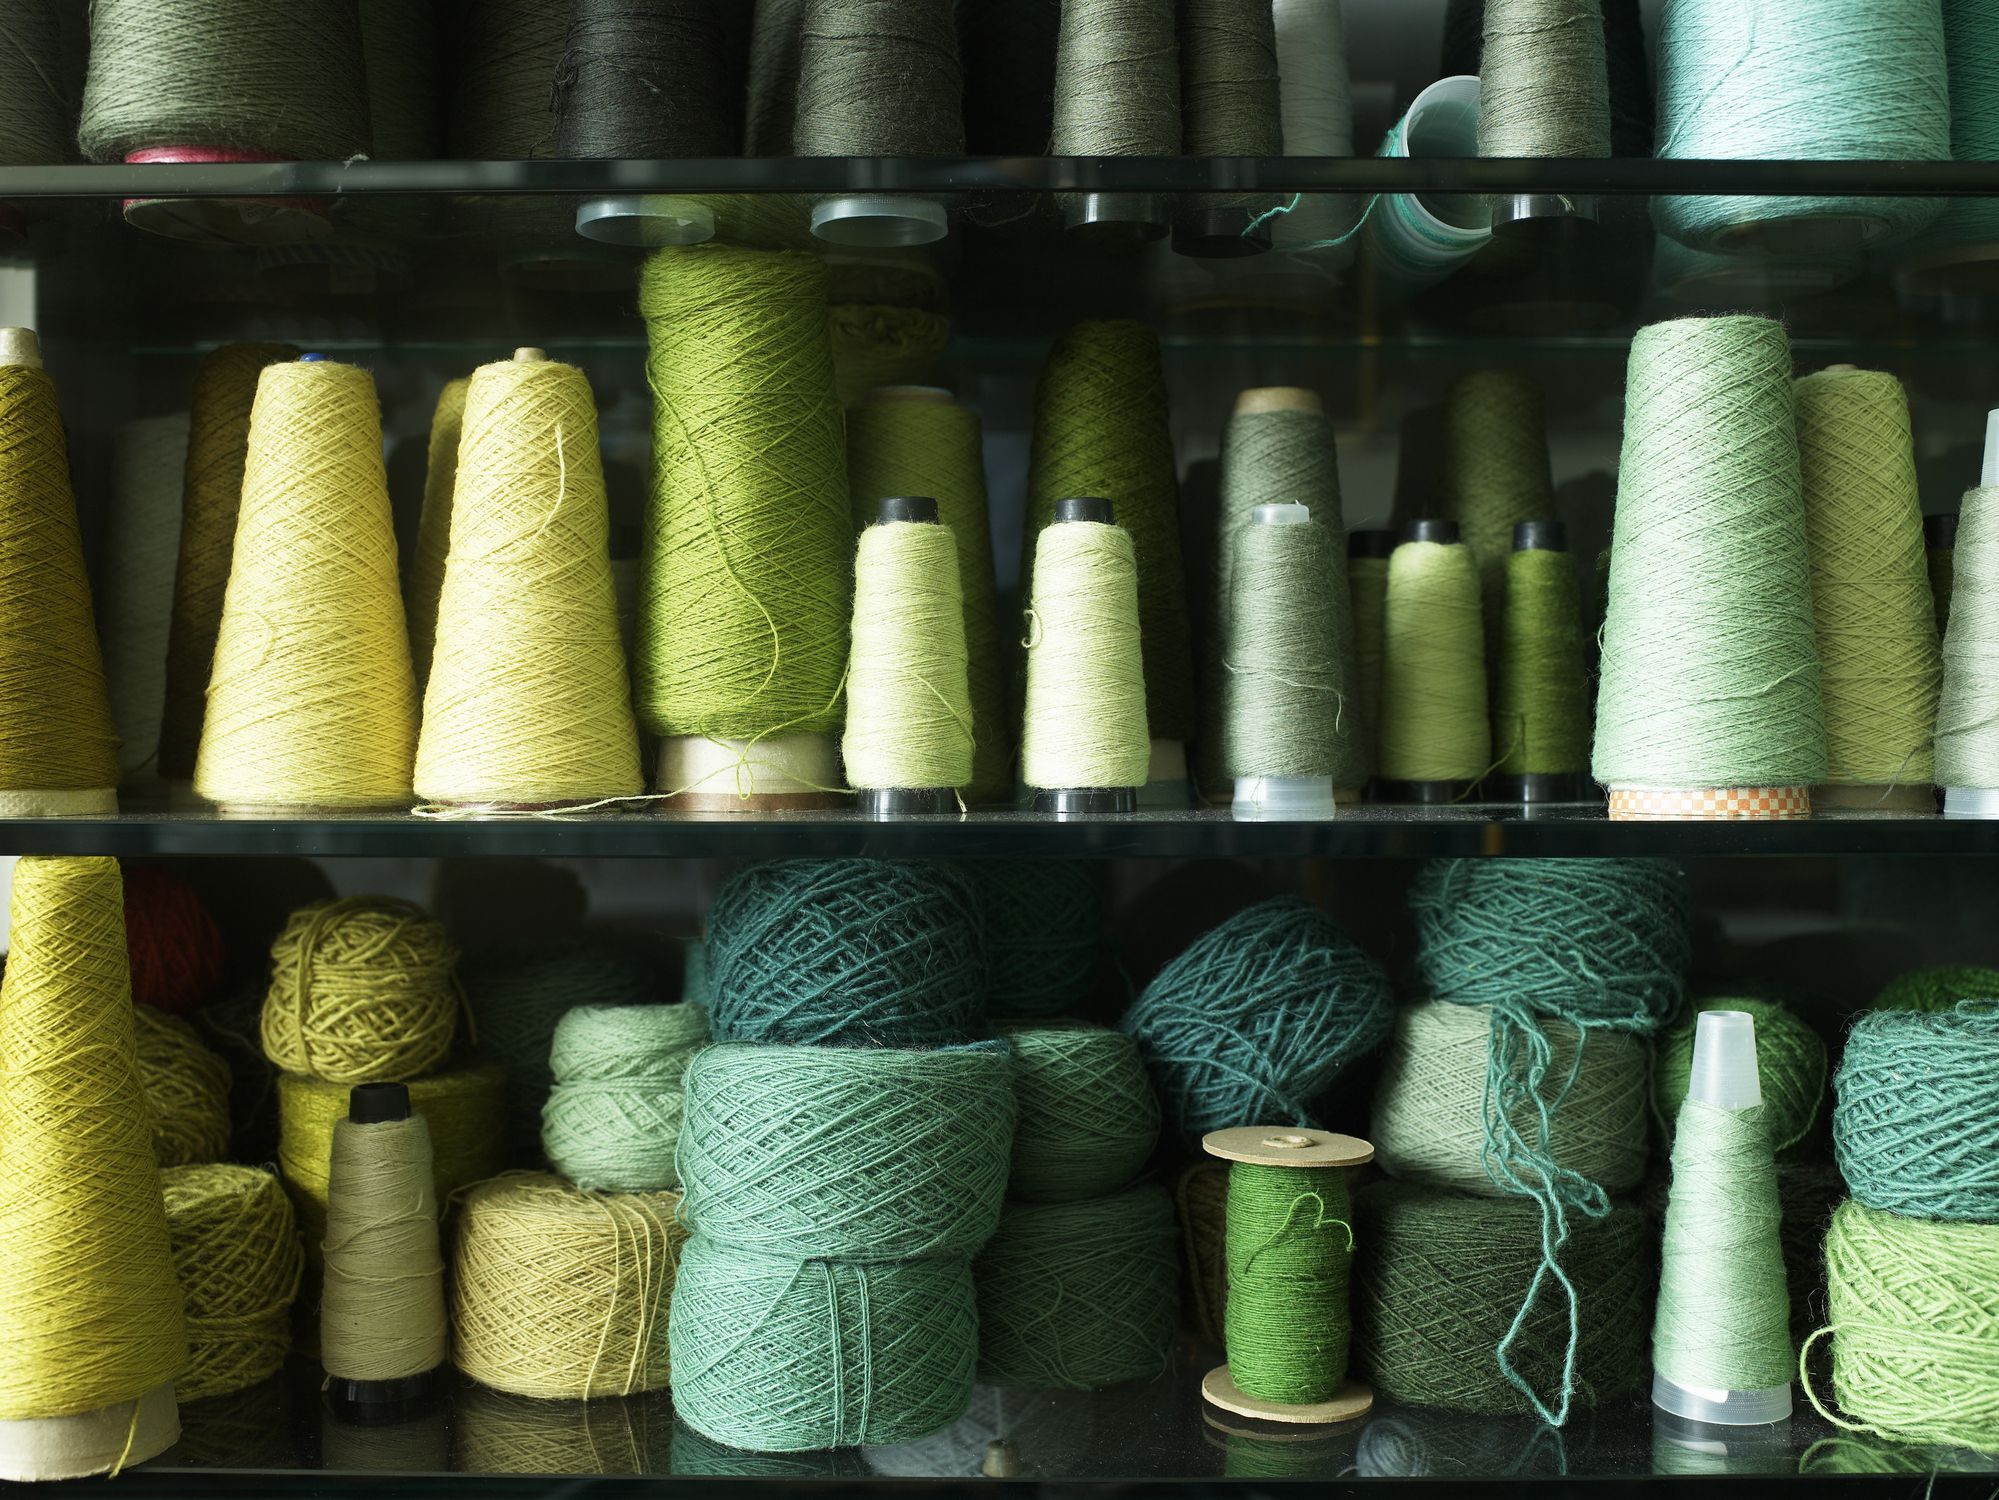 Coats & Clark Sewing Thread Company